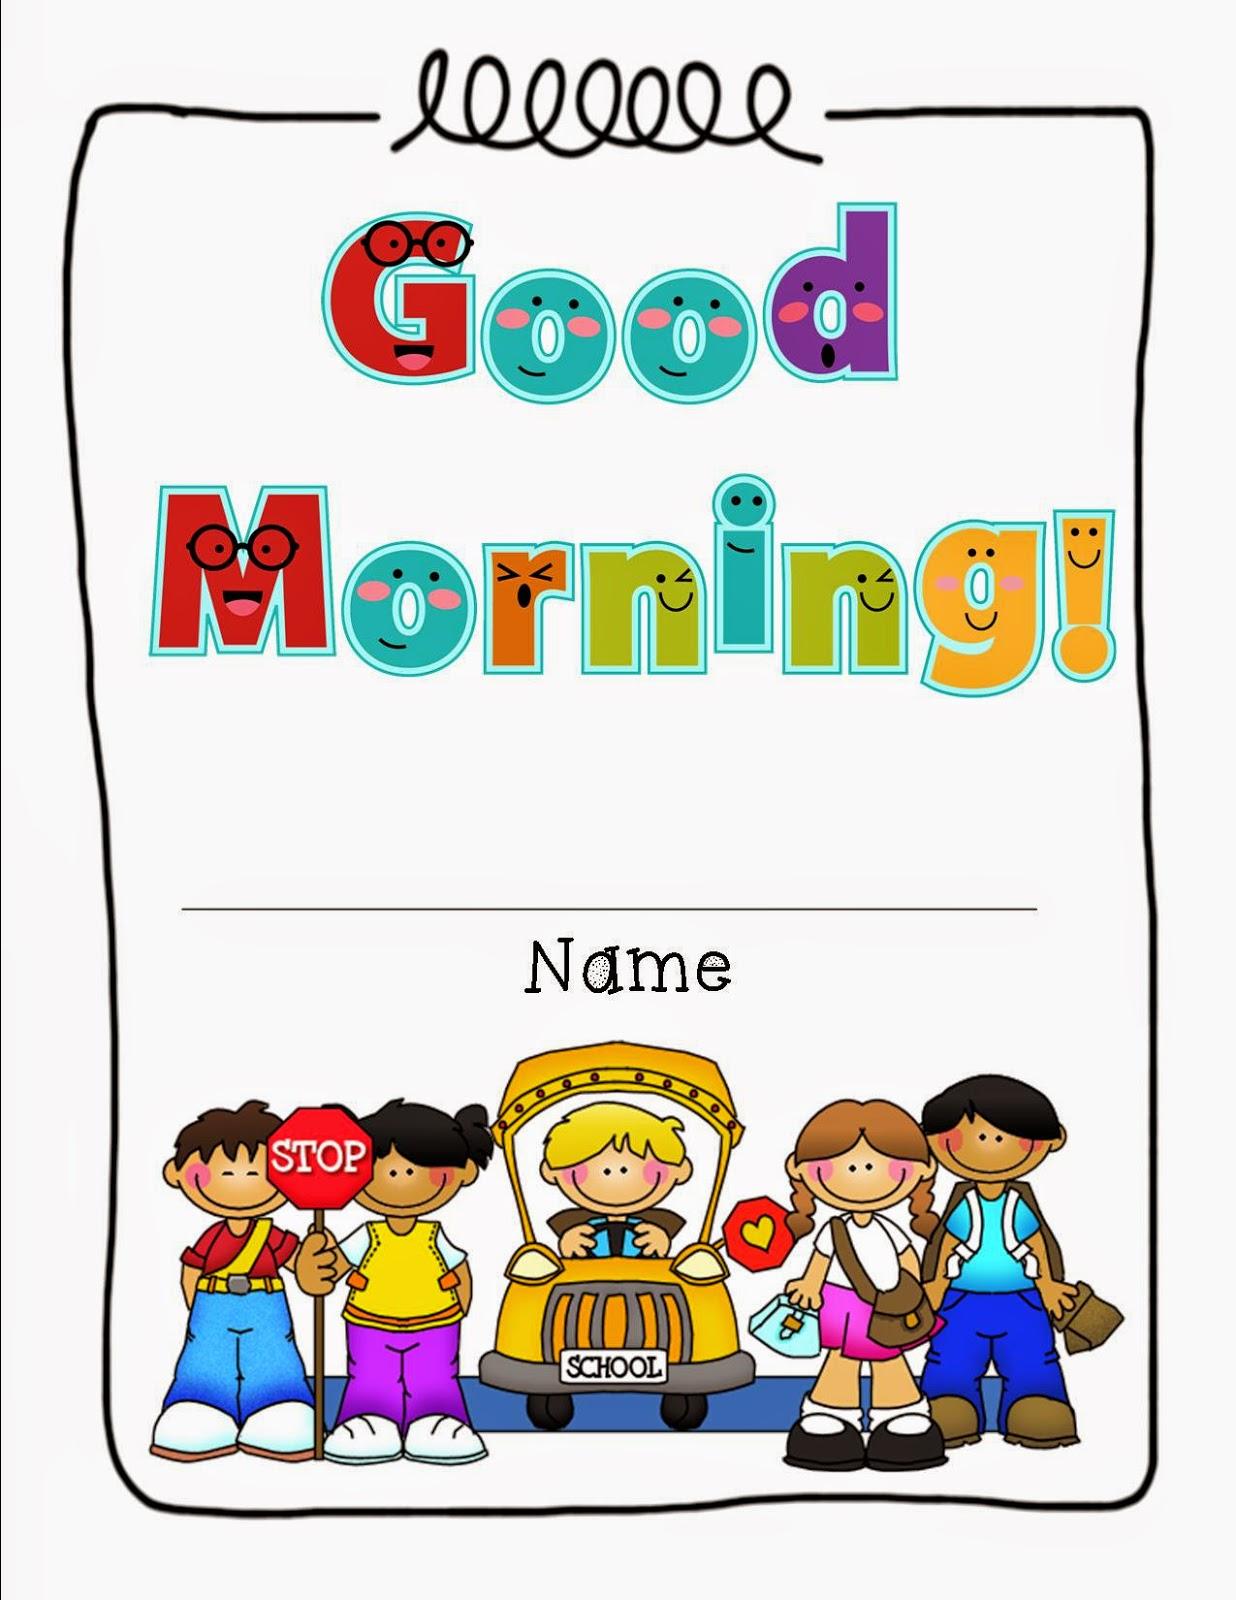 http://www.teacherspayteachers.com/Product/4th-Grade-Morning-Work-740441